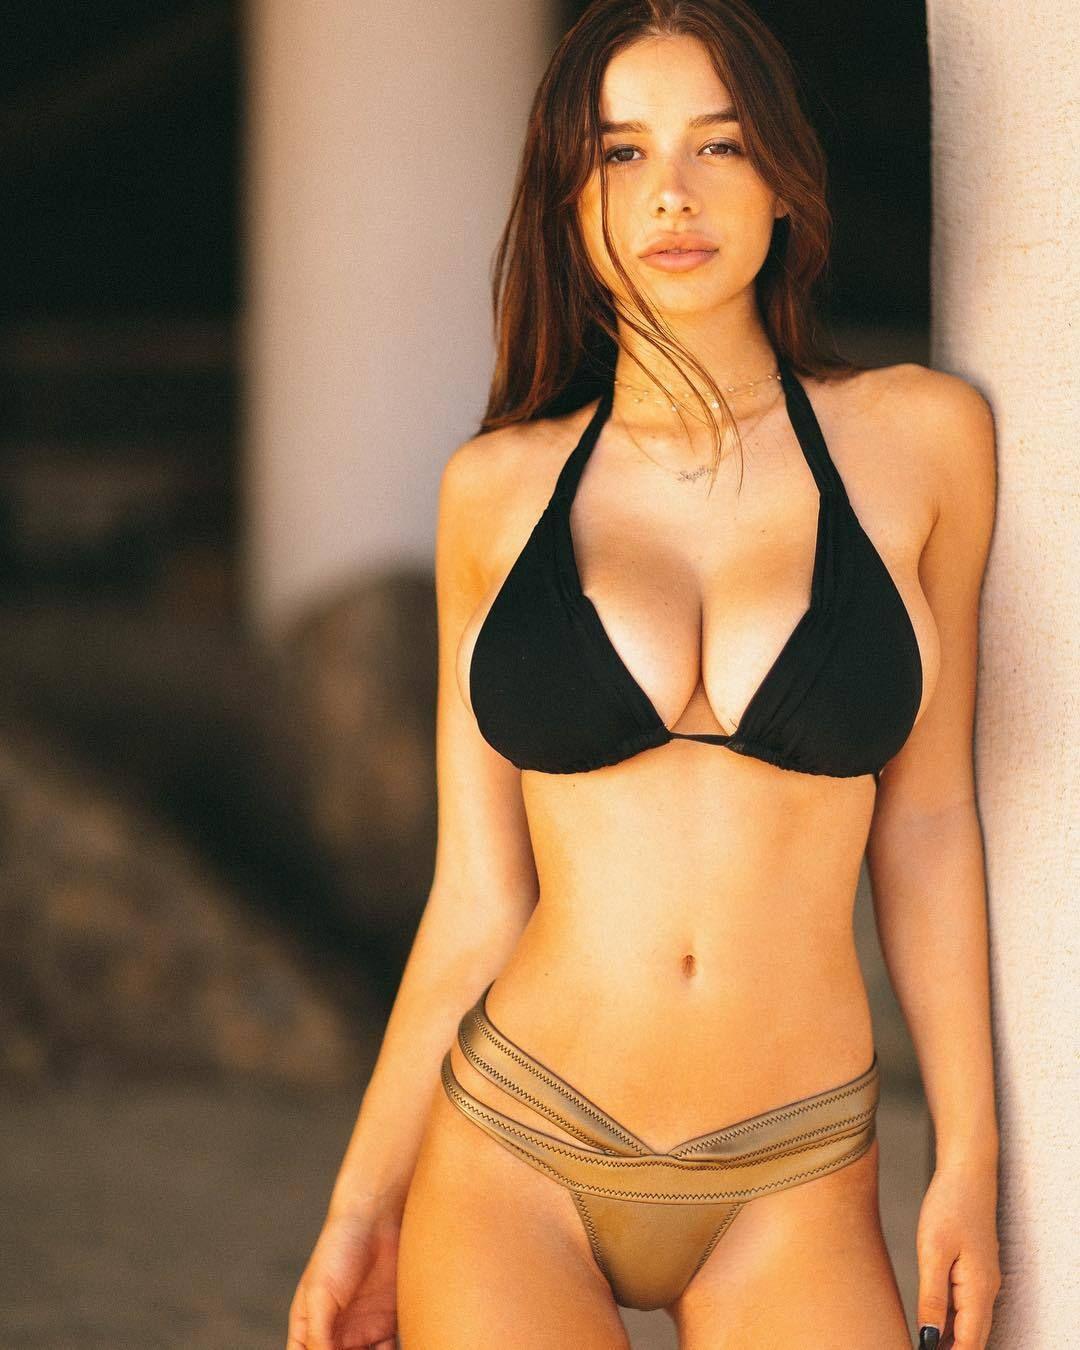 Celebrites Sophie Mudd nudes (65 photo), Sexy, Cleavage, Twitter, butt 2020